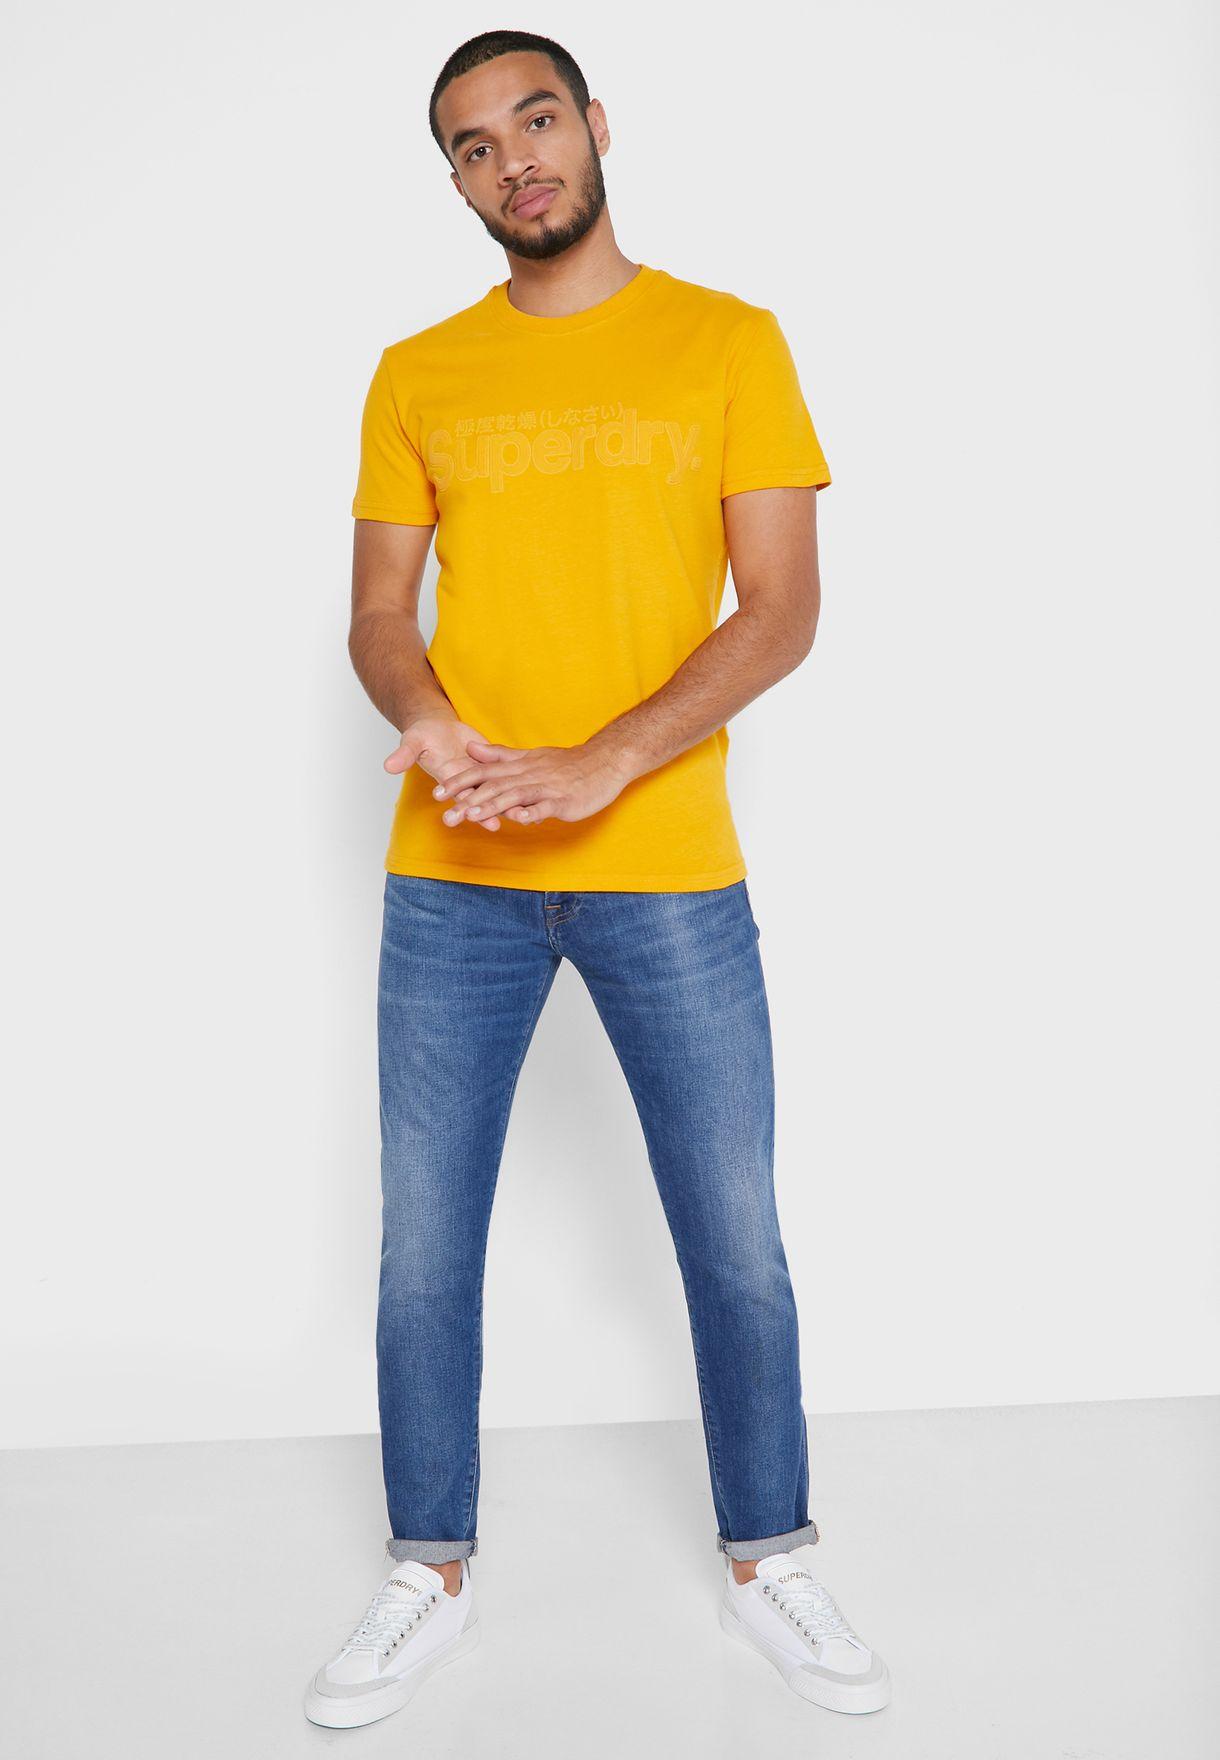 Care Faux Suede Crew Neck T-Shirt